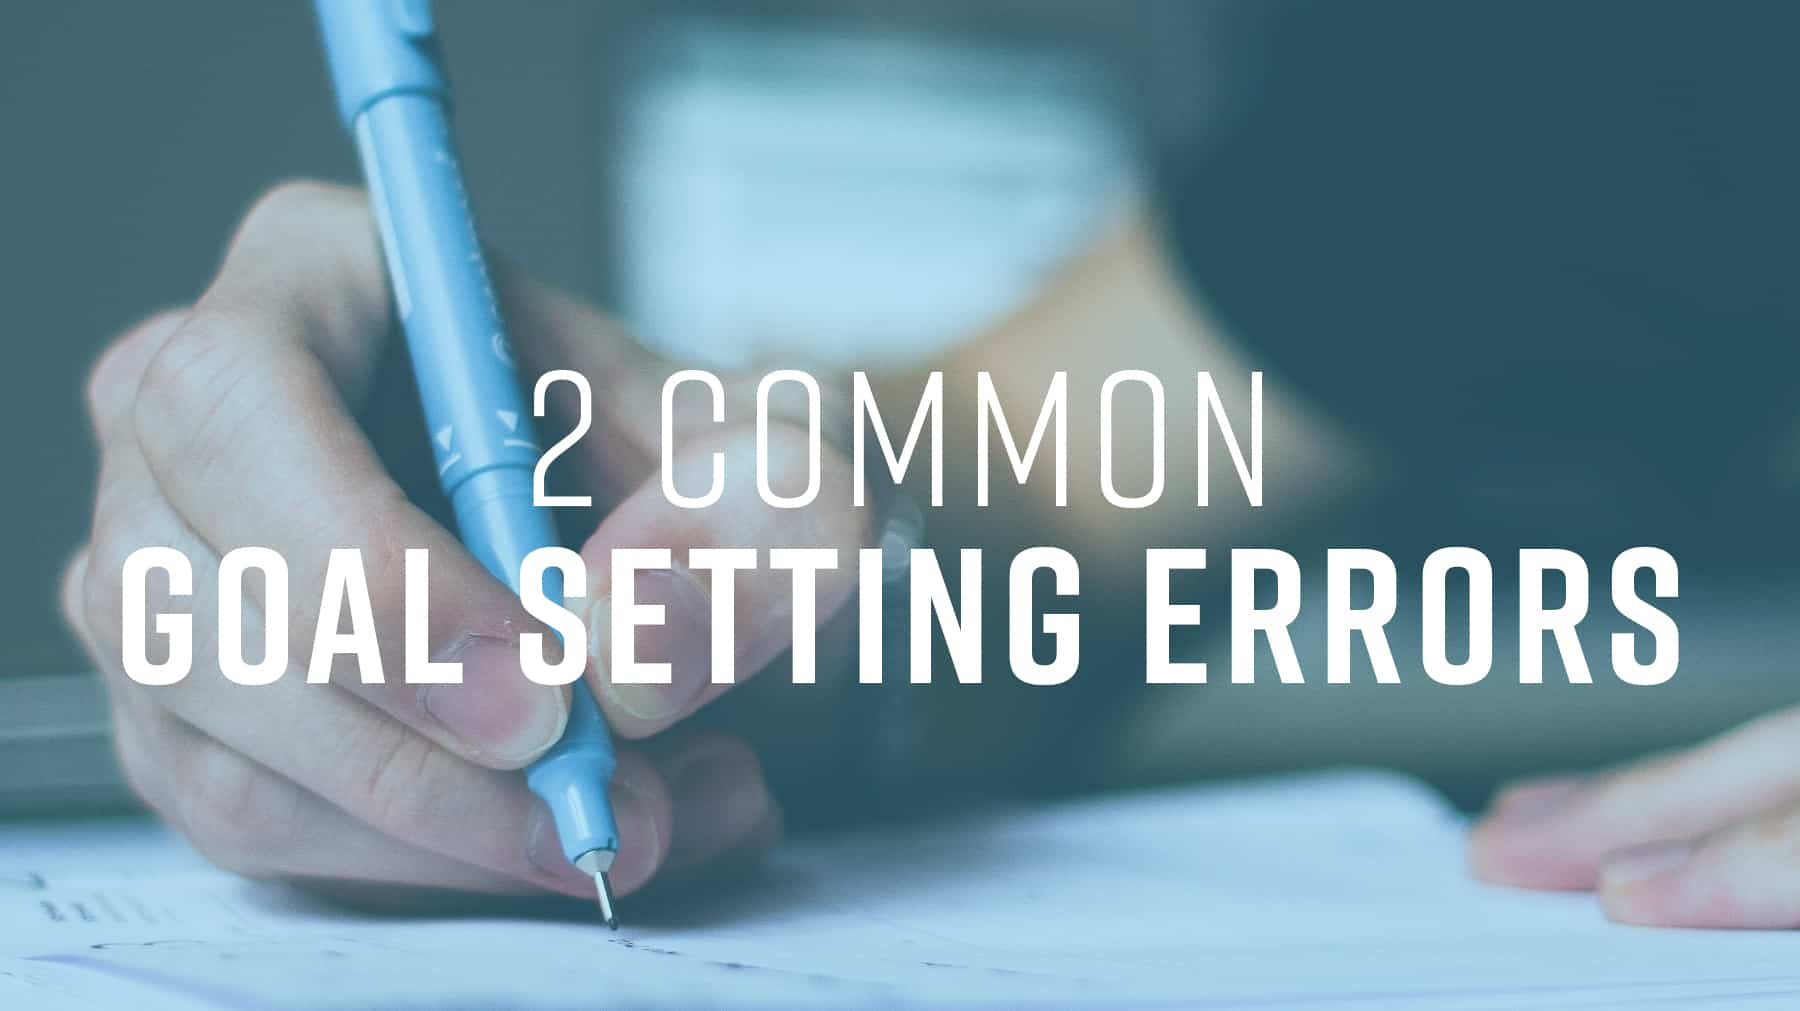 2 common goal setting errors